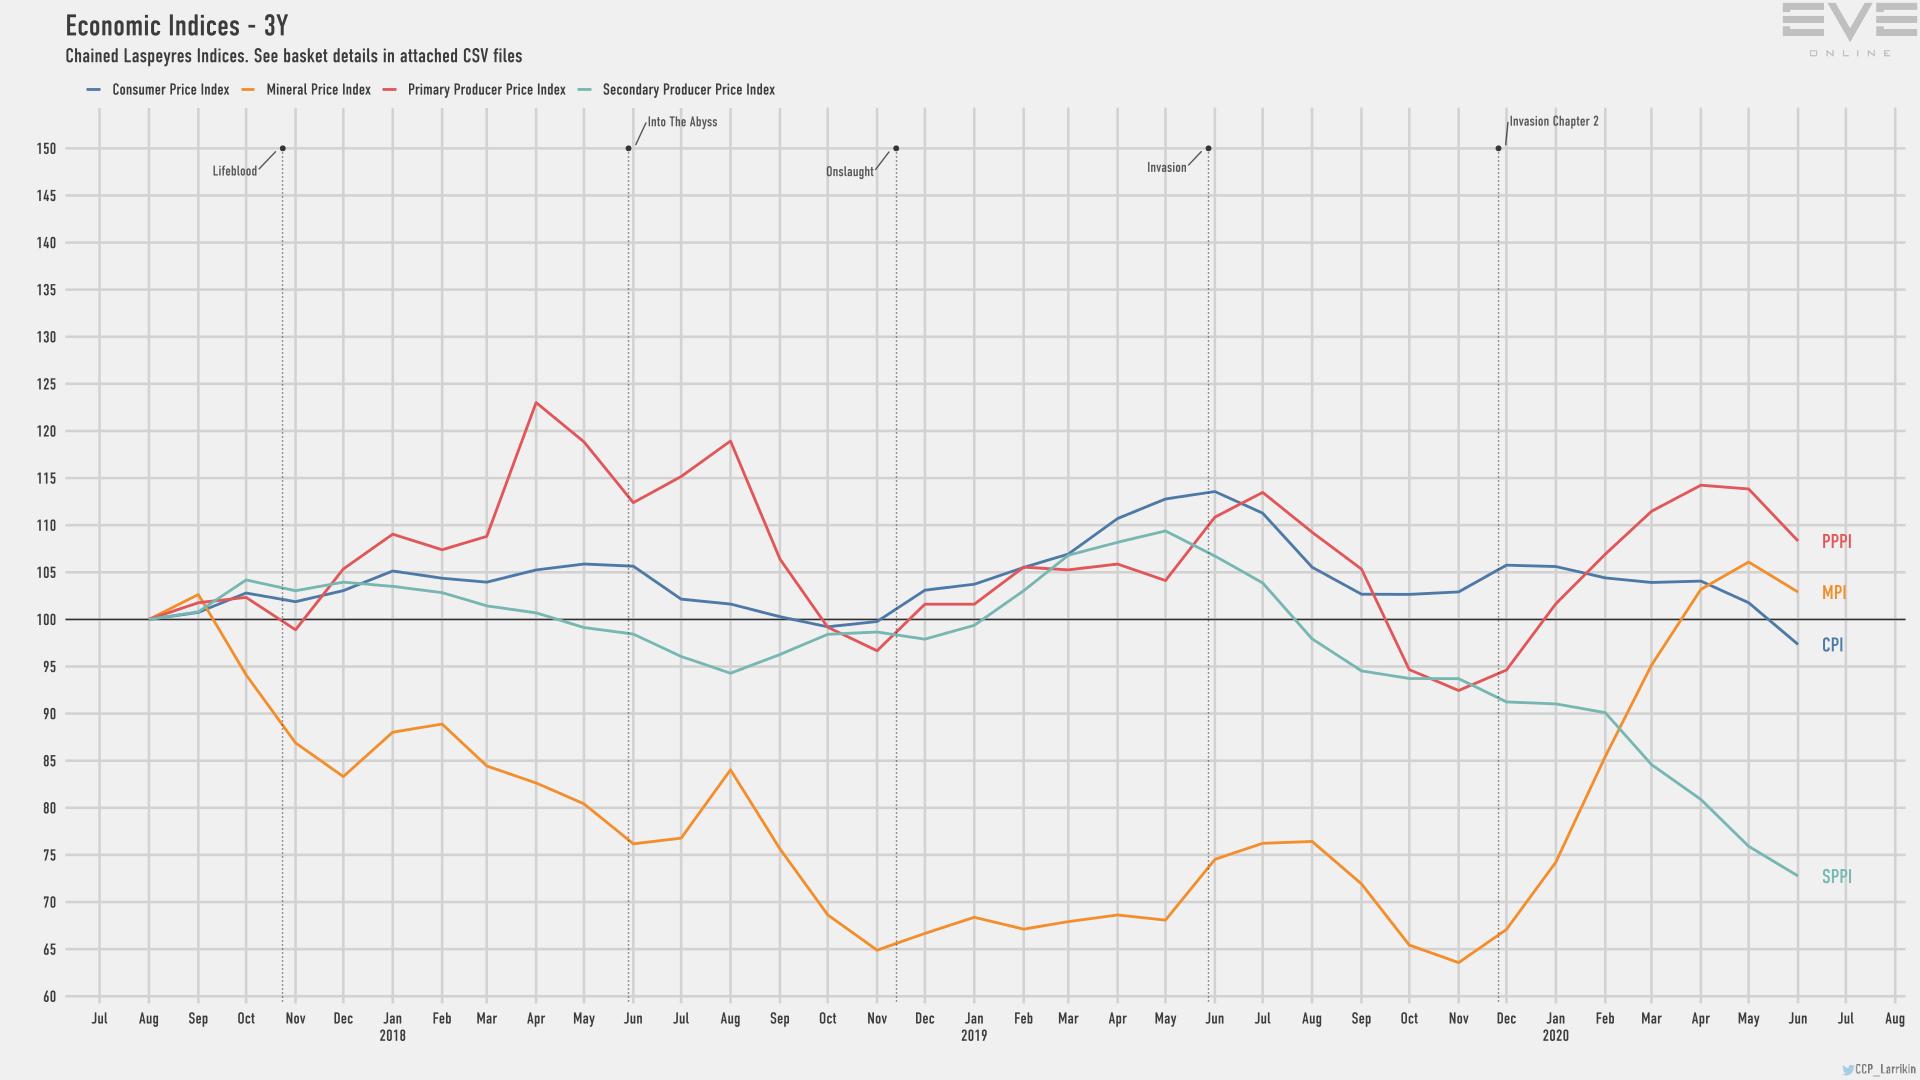 9d economy.indices.short